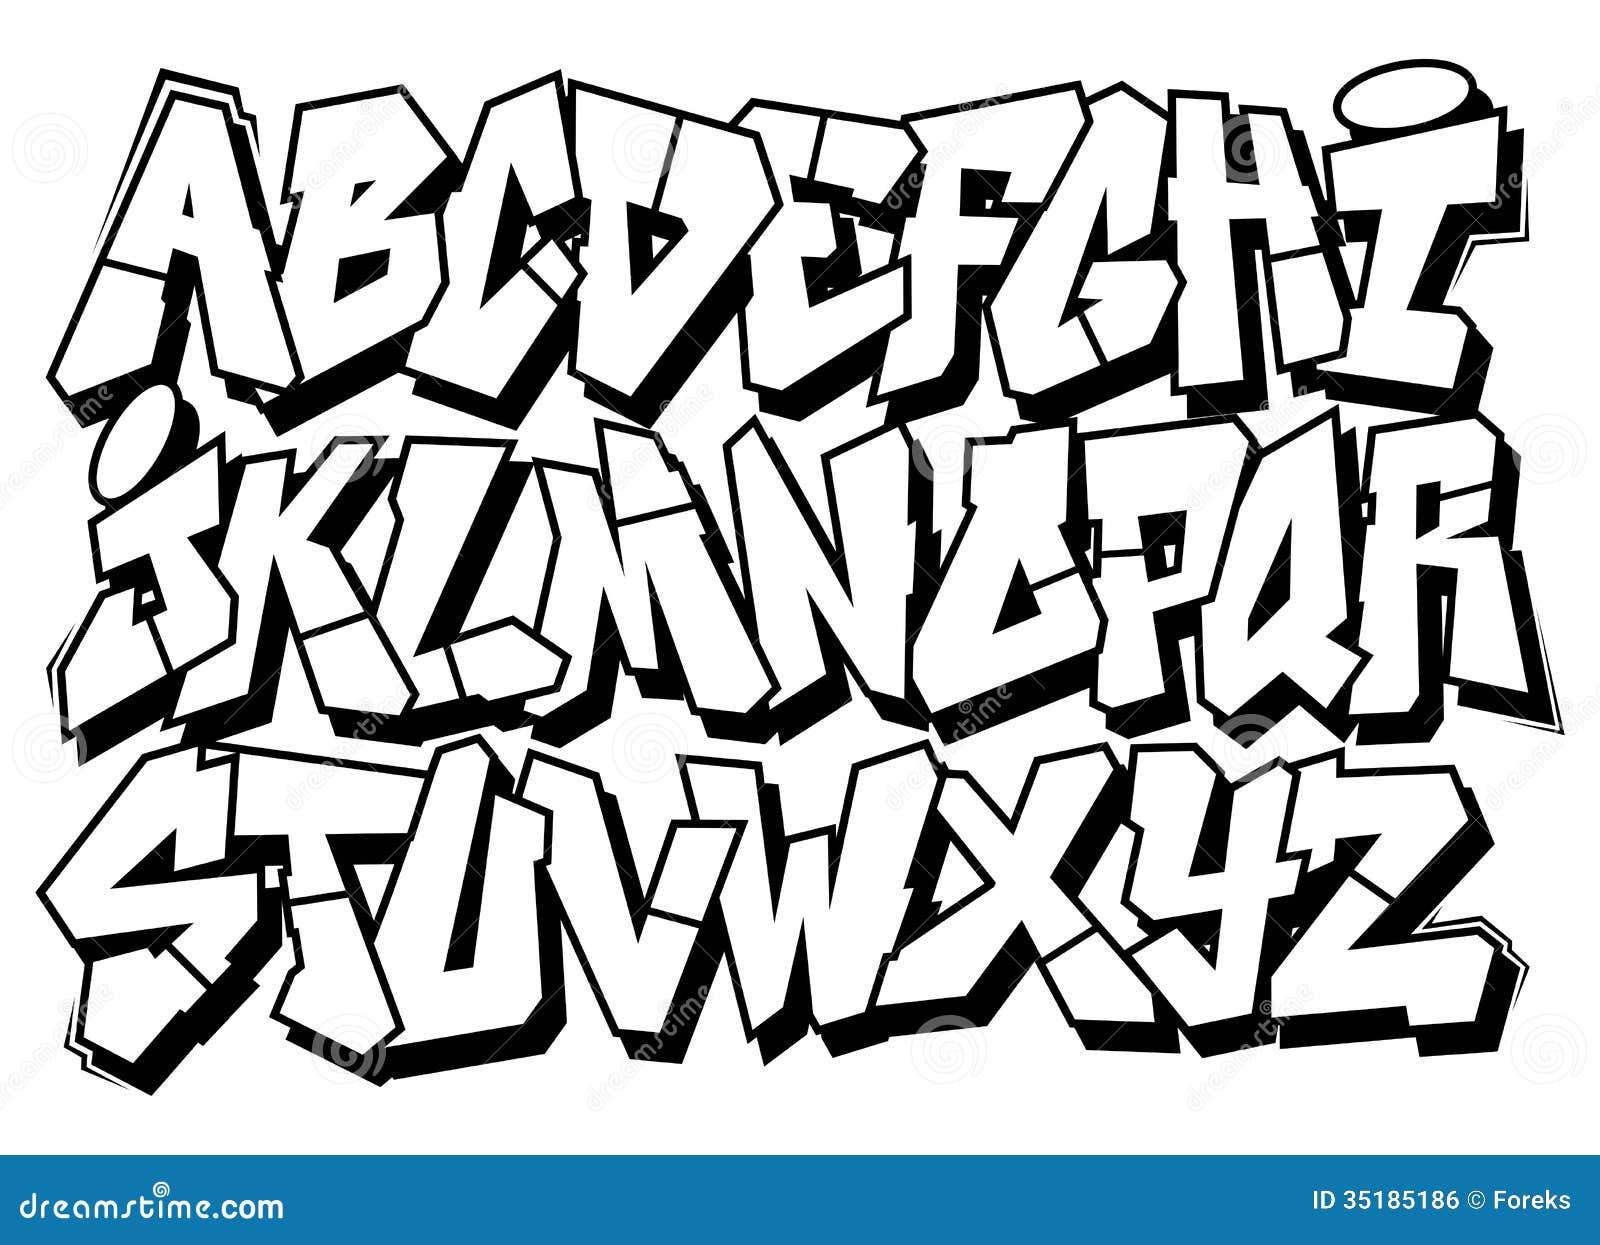 Type classique alphabet de police de graffiti d art de rue